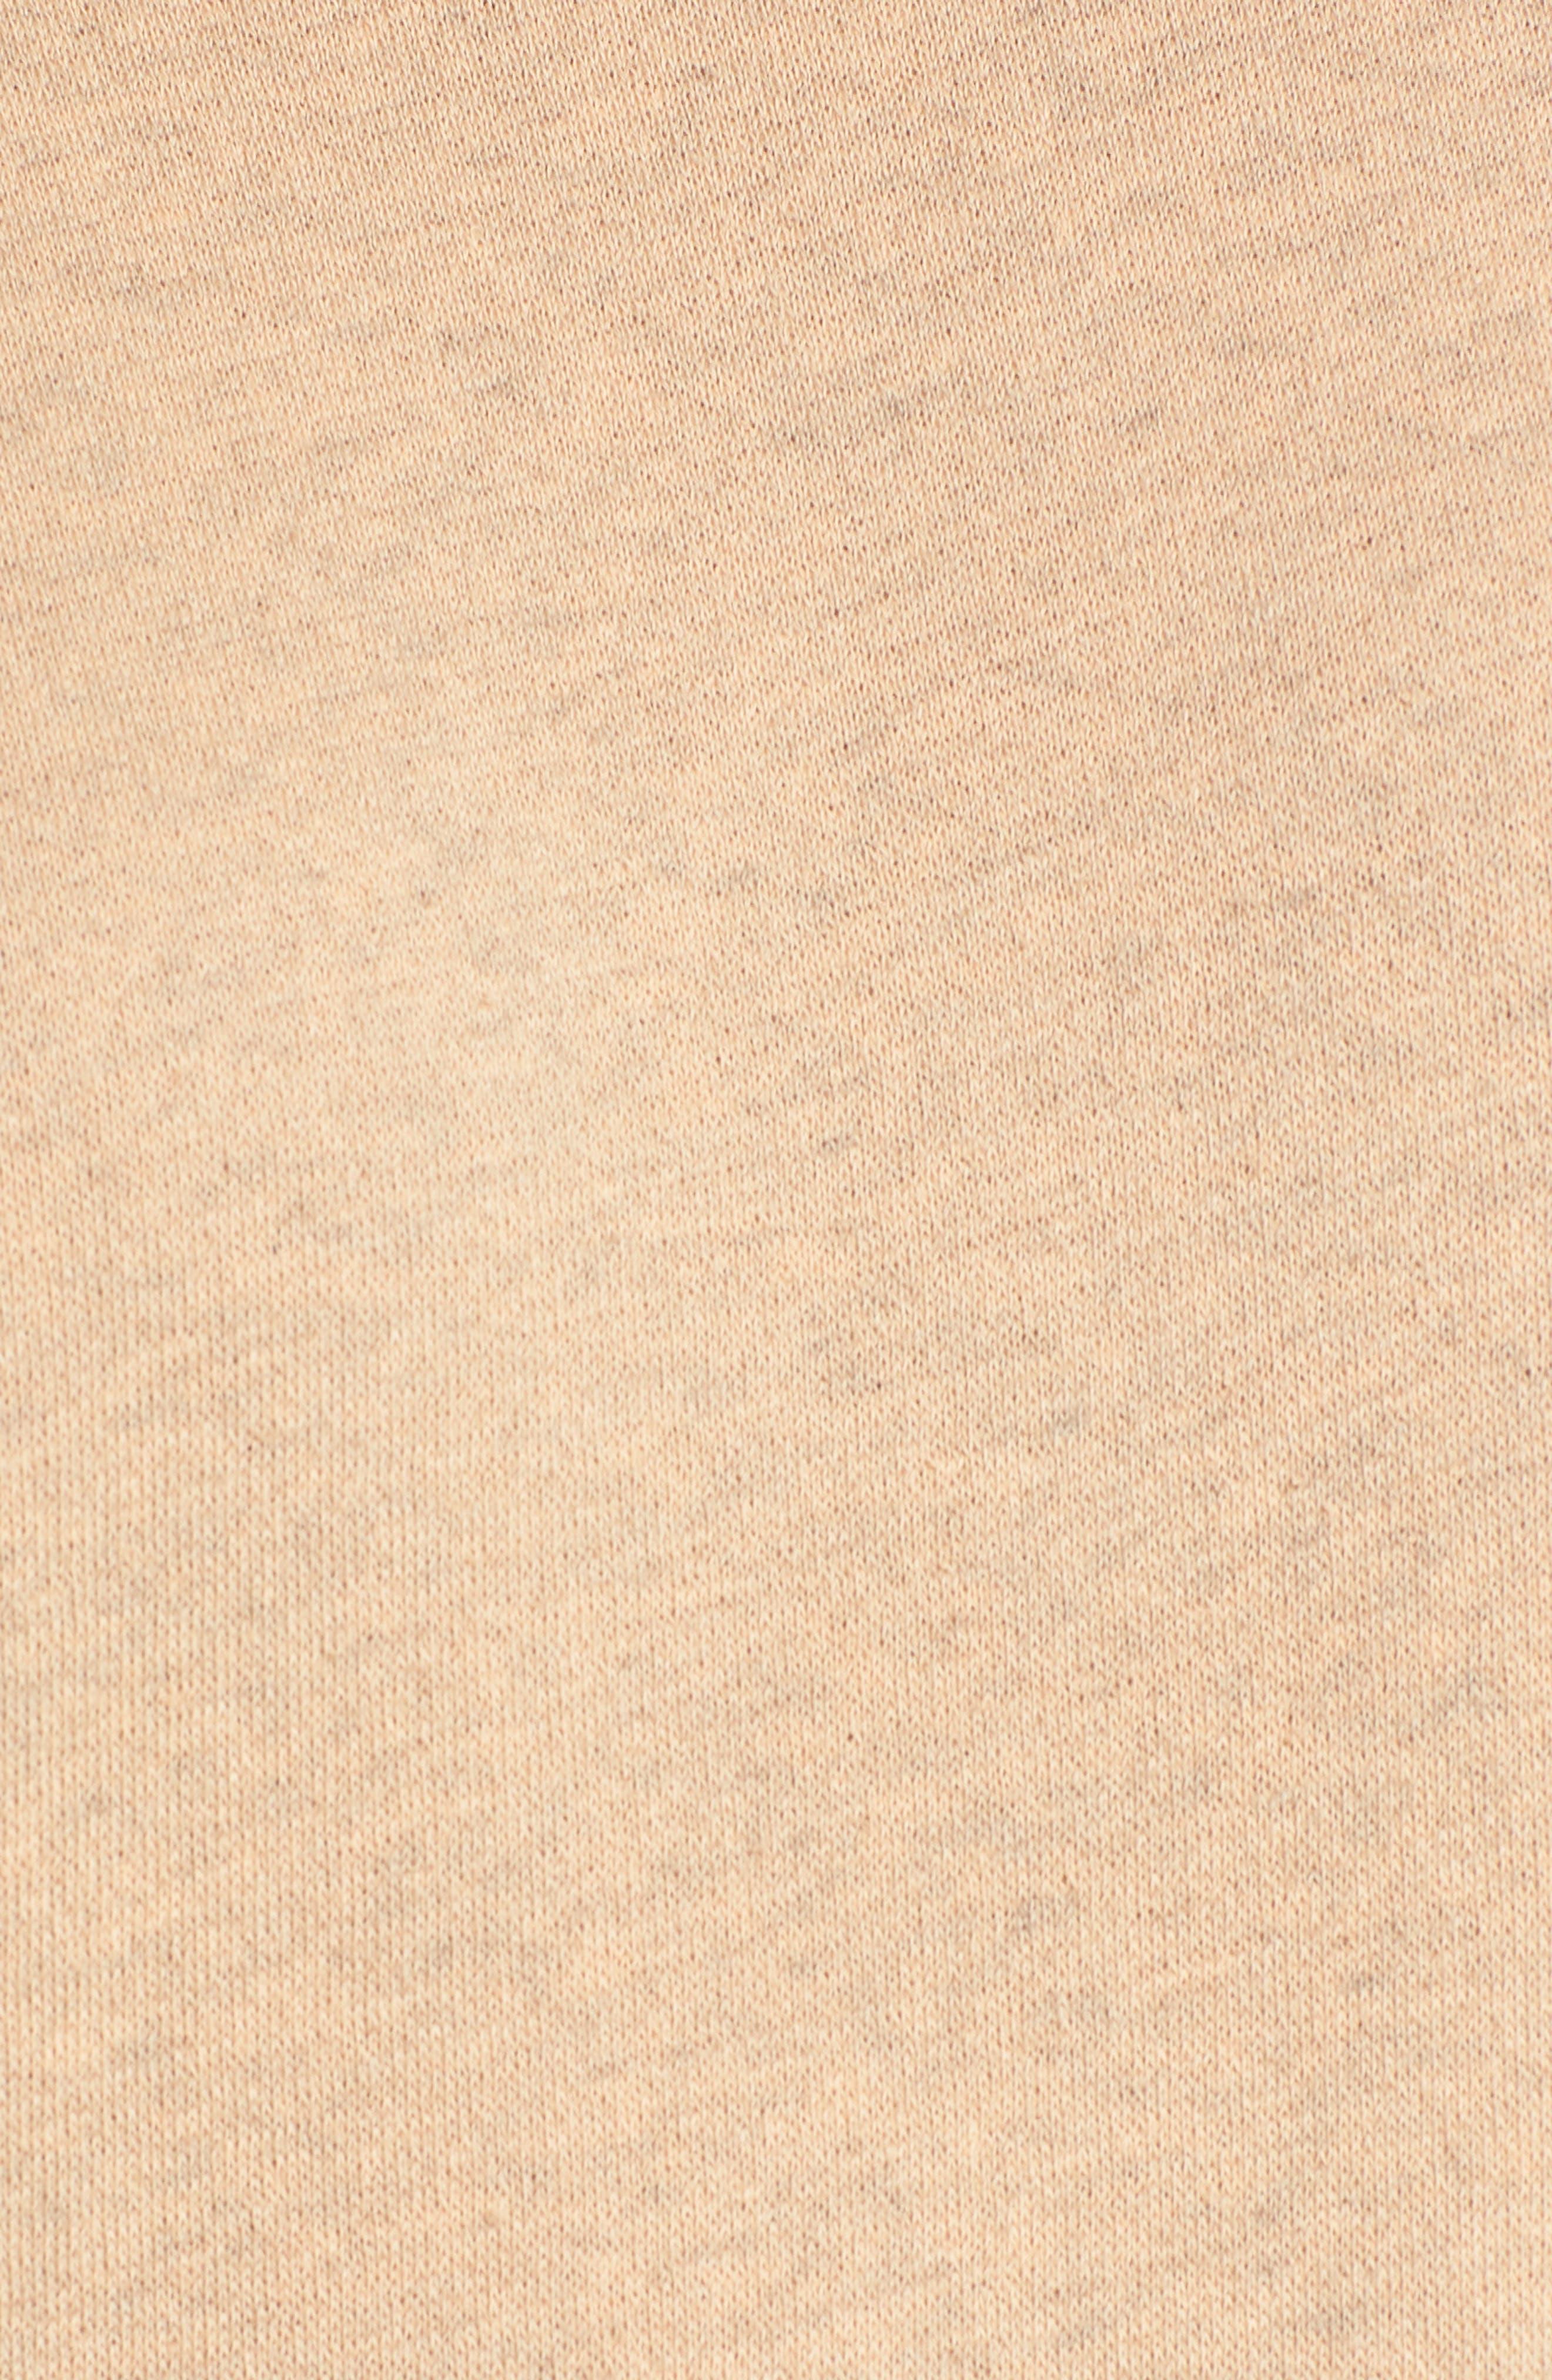 Mainstay Sweatshirt,                             Alternate thumbnail 6, color,                             Hthr Dune